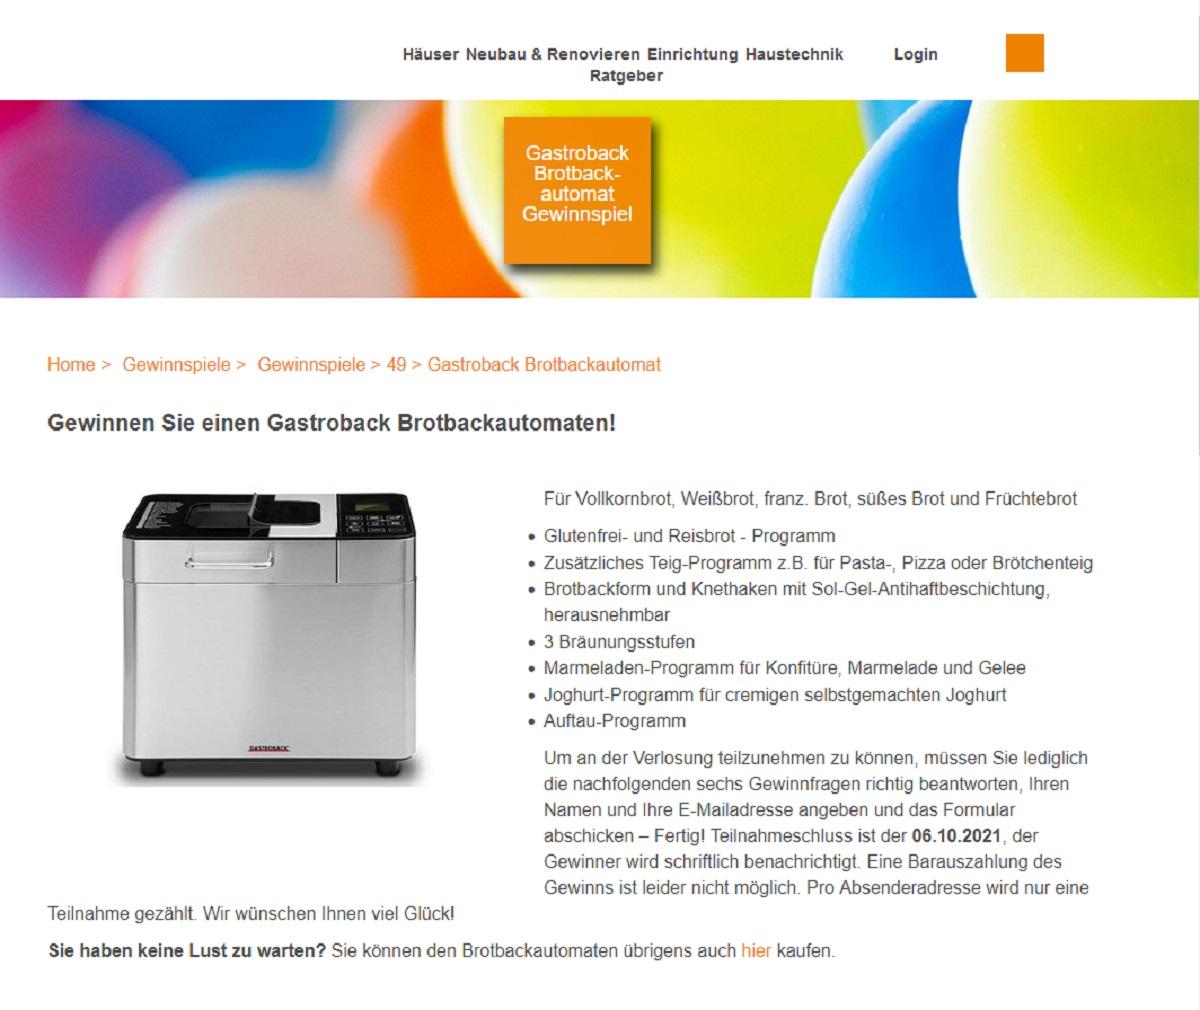 Gastroback Brotbackautomaten gewinnen - homeplaza.de Gewinnspiel